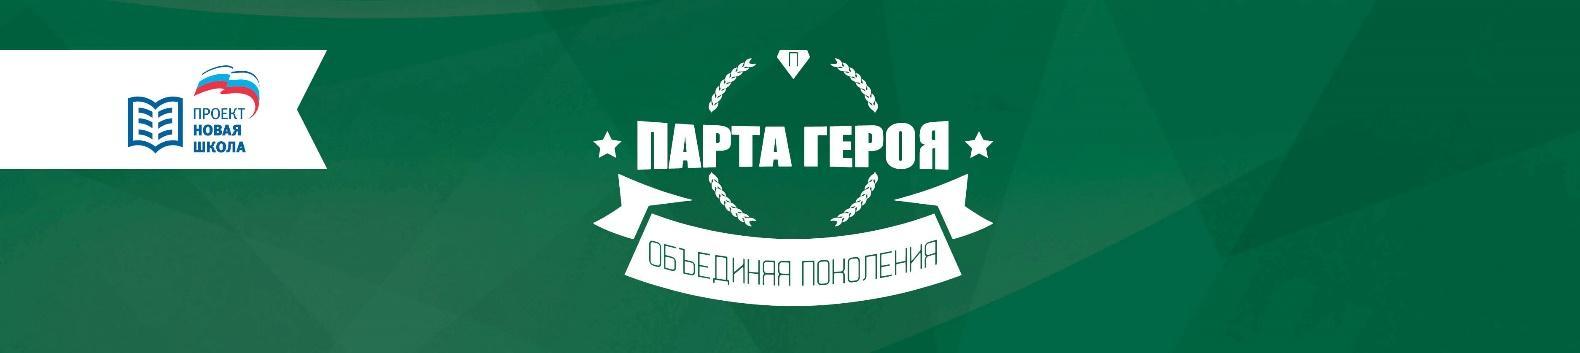 http://school30.roovr.ru/netcat_files/userfiles/Mart2019/foto_1_razdel.jpg